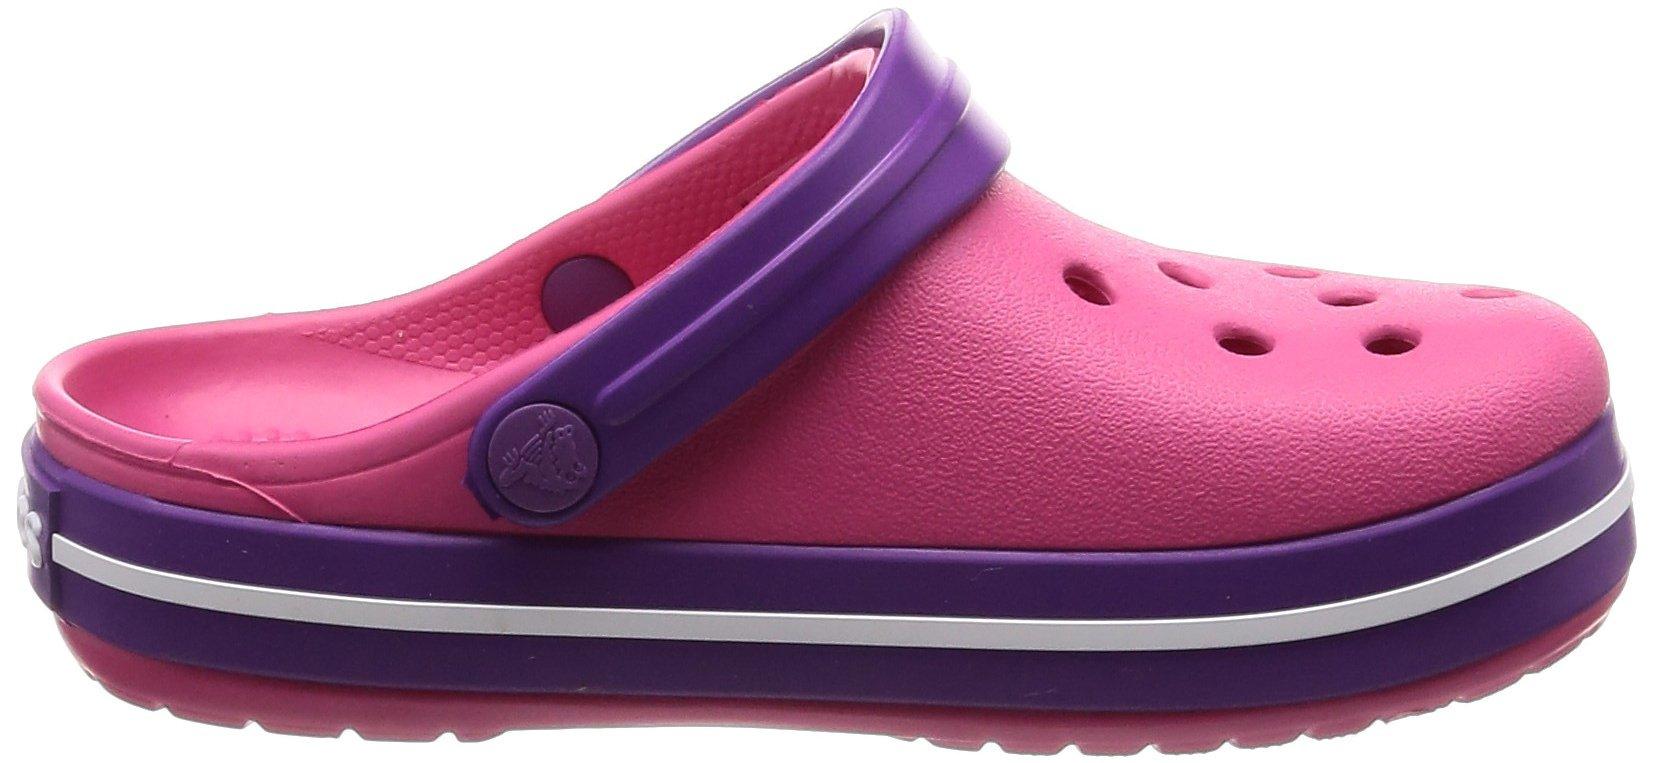 Crocs Kids' Crocband Clog, Paradise Pink/Amethyst, 1 M US Little by Crocs (Image #6)